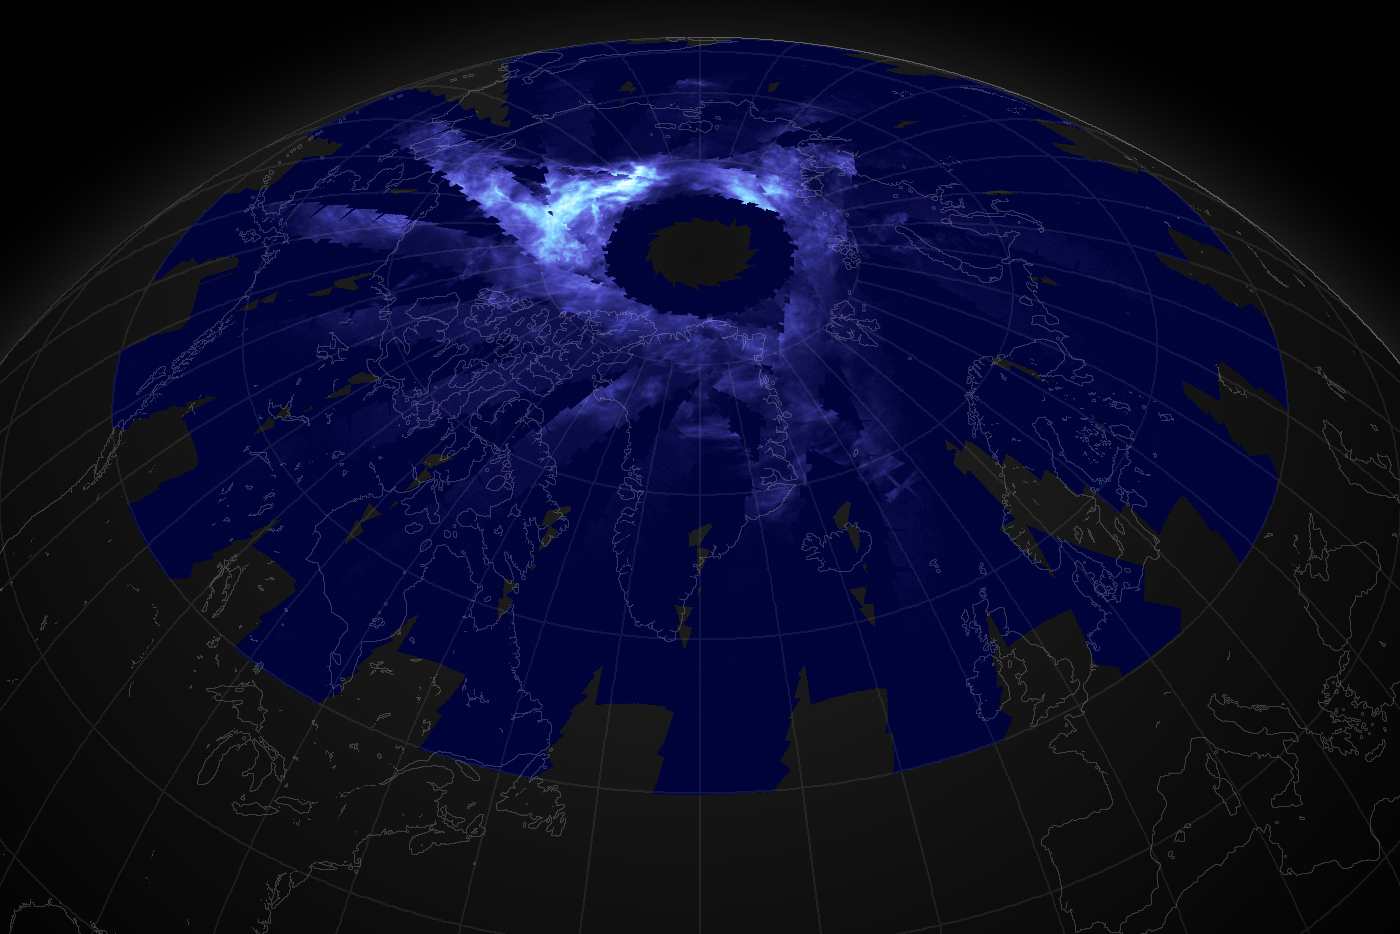 NASA image: Night-shining clouds